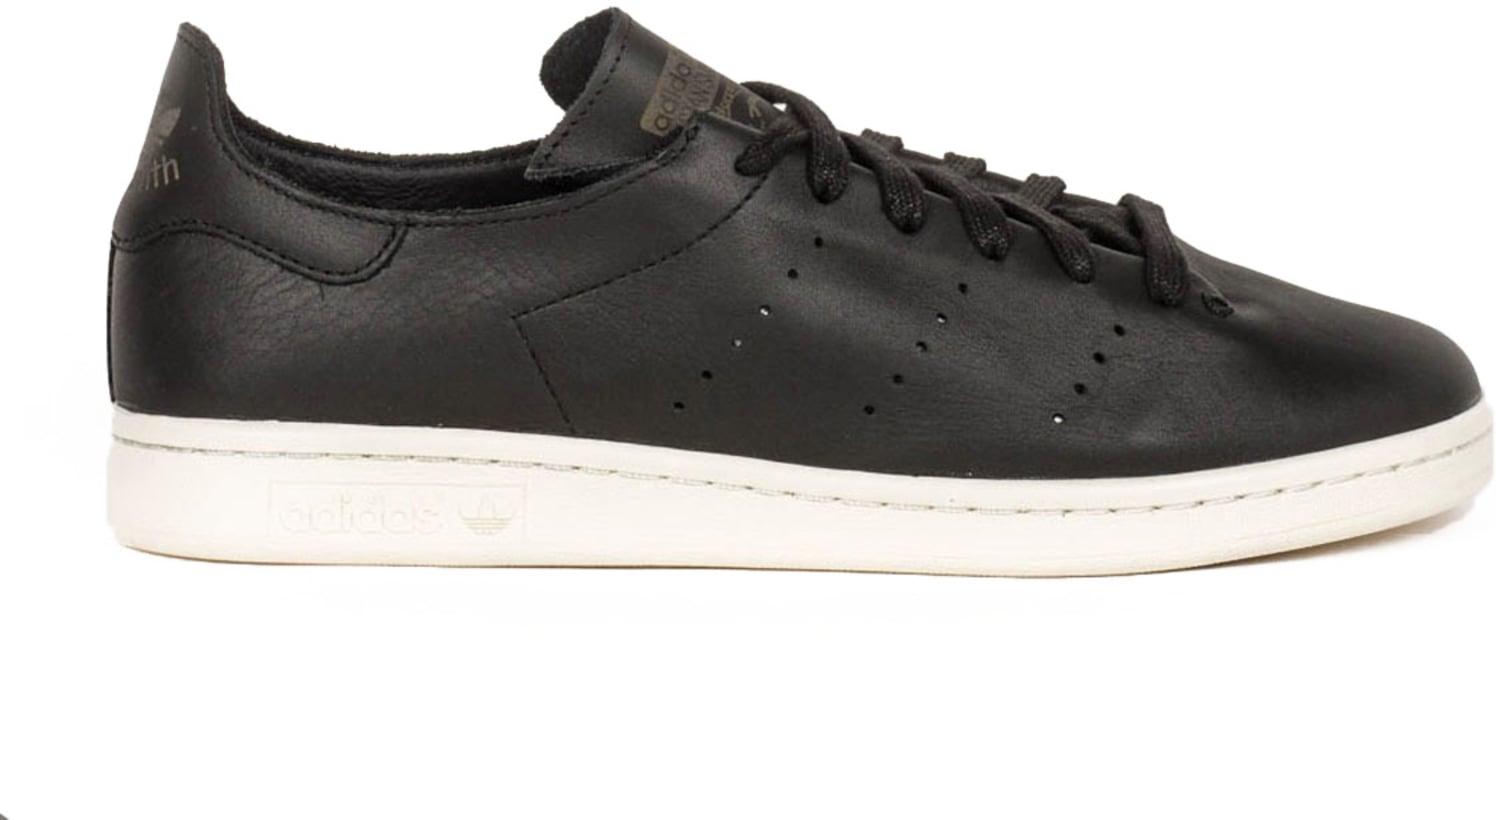 b564baf6b73e Stan Smith Leather Sock Sneakers - Black